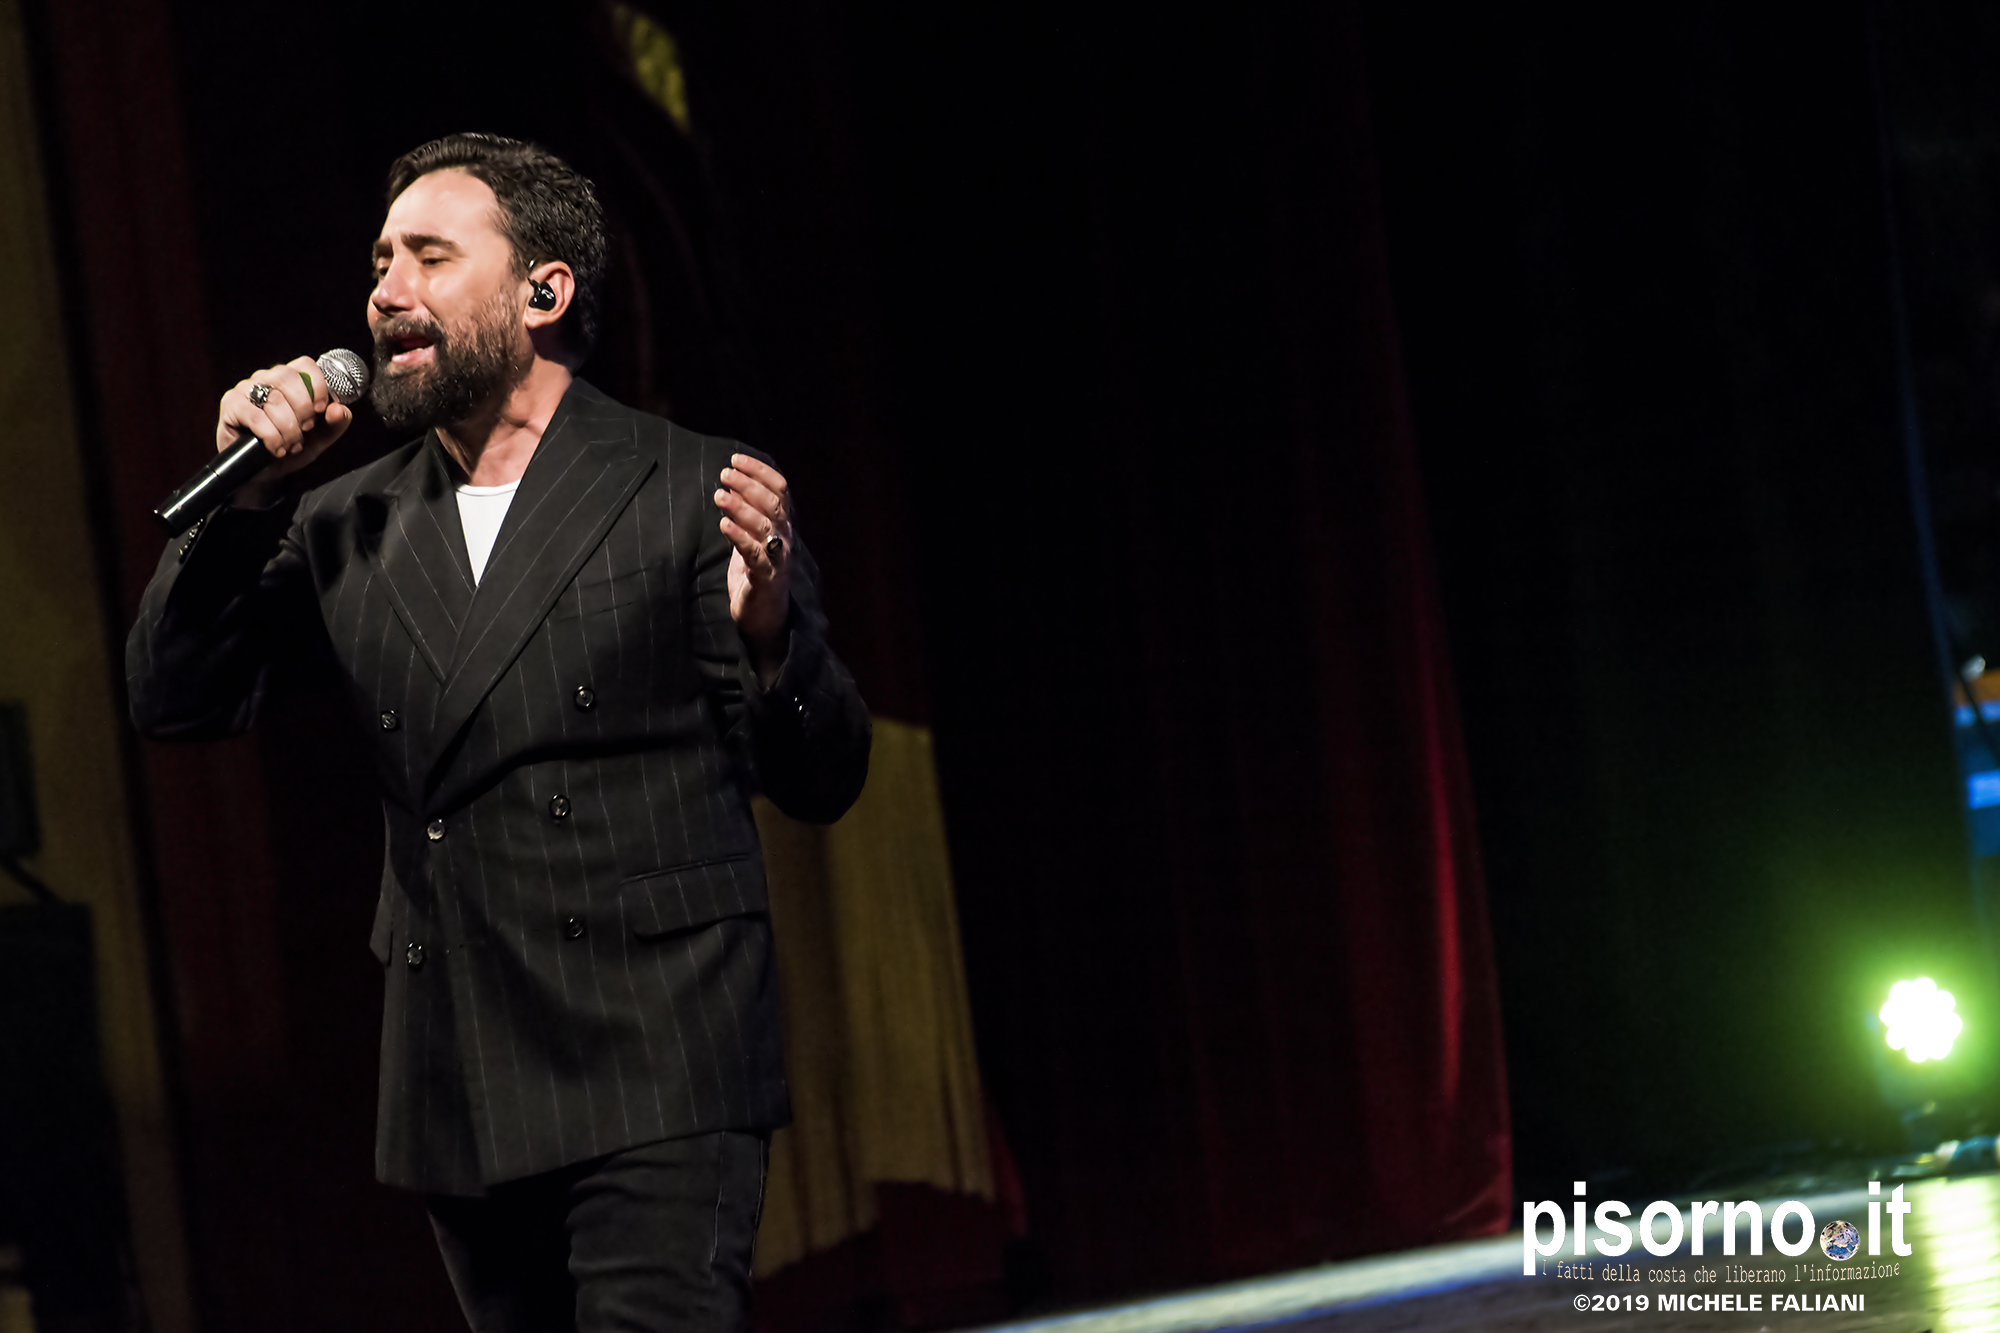 Tiromancino live @ Teatro Verdi (Firenze, Italy), 21 Gennaio 2019